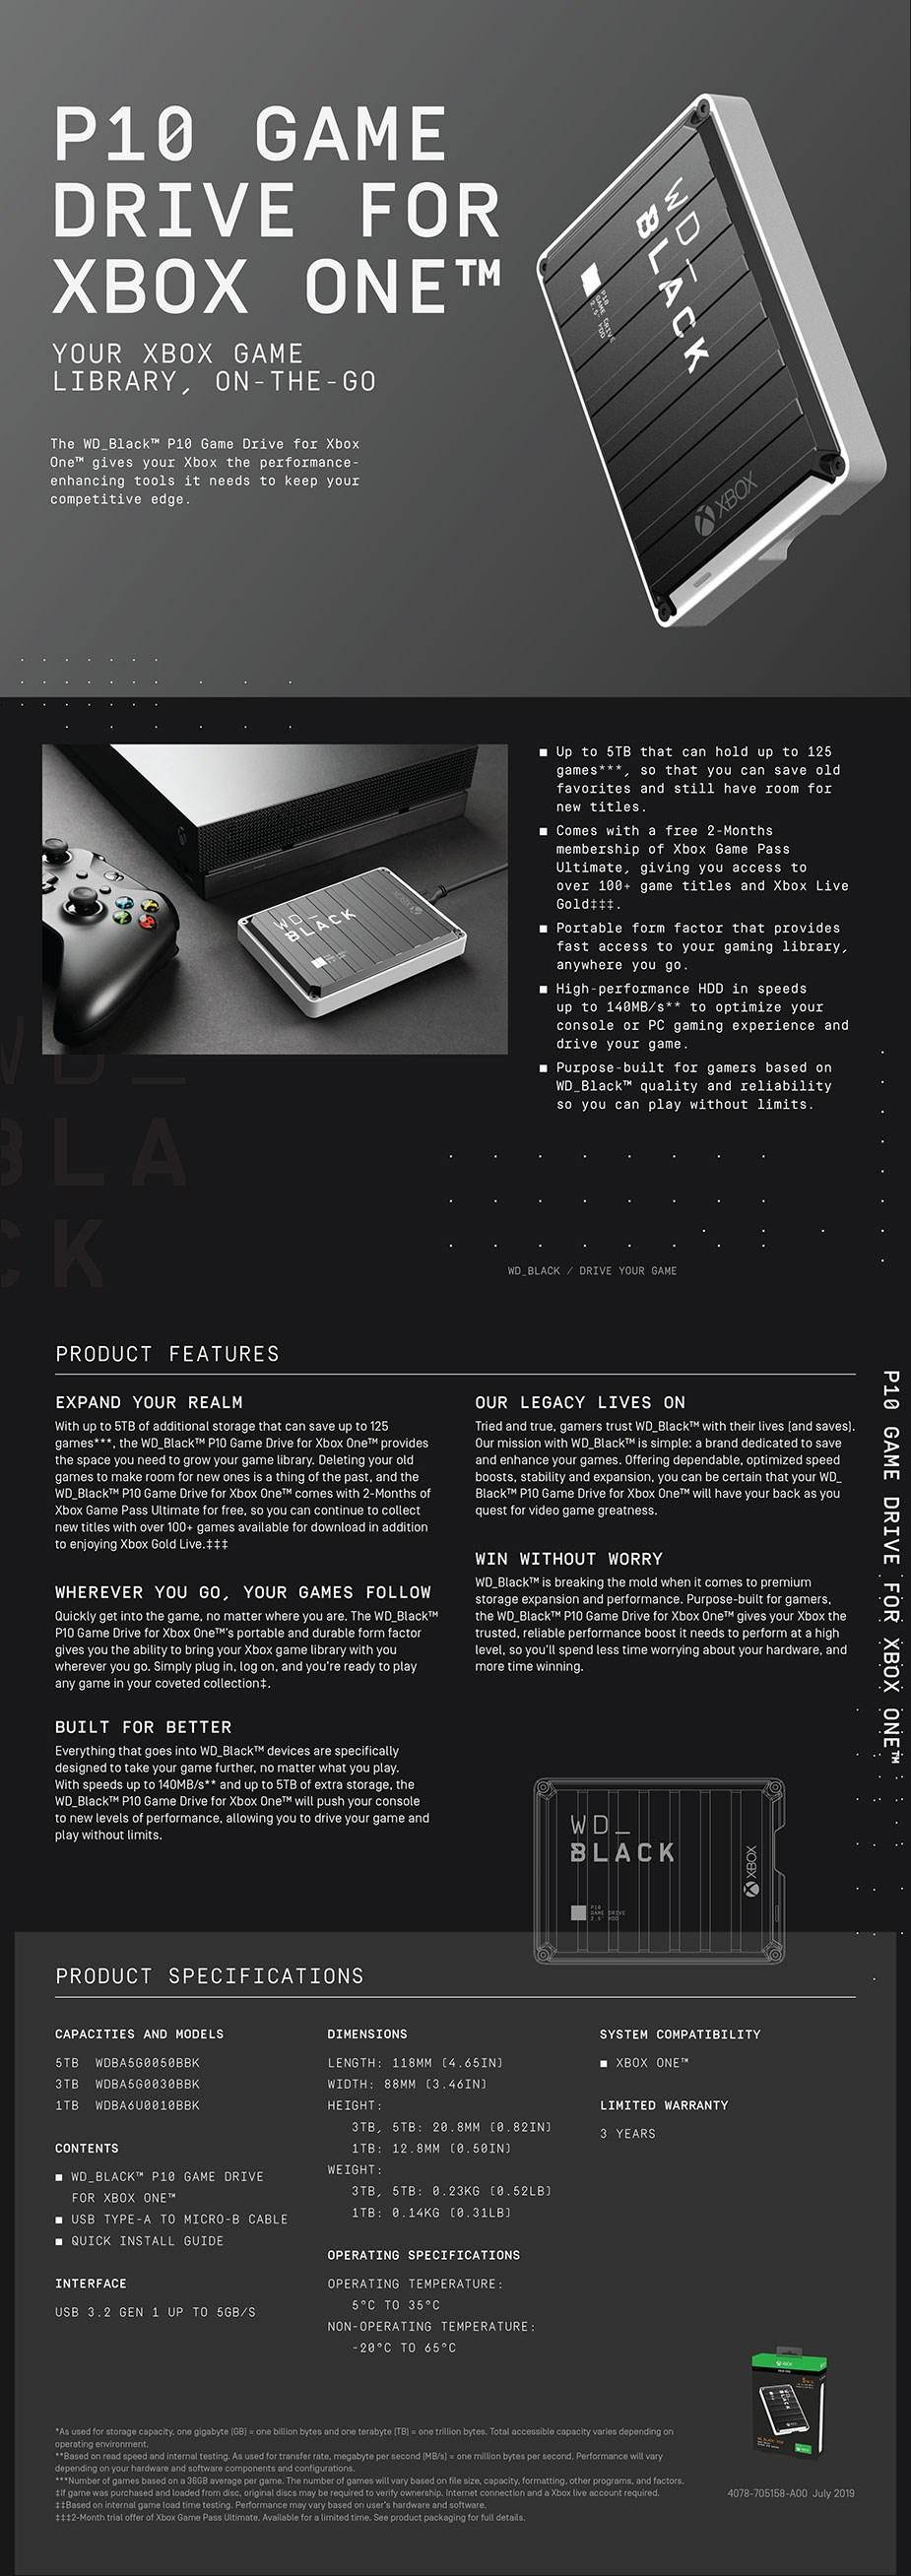 wd-black-3tb-p10-gaaame-drive-for-xbox-one-wdba5g0030bbk-ac31472-6.jpg